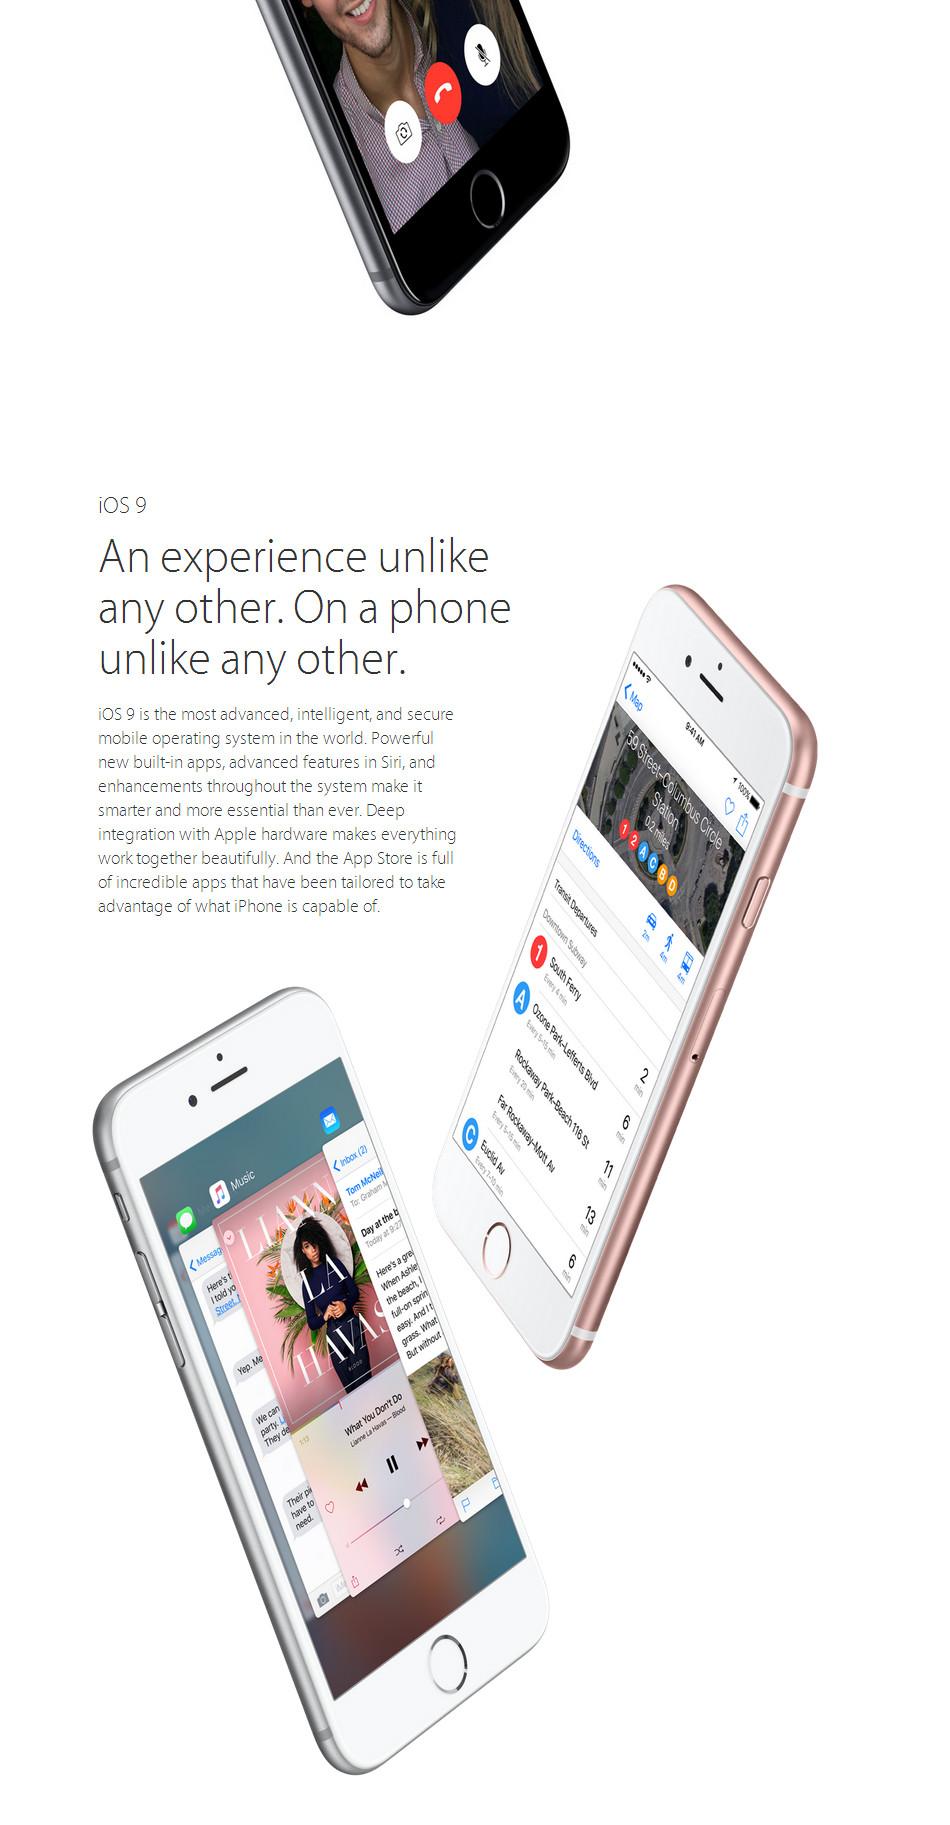 iPhone-6s_06